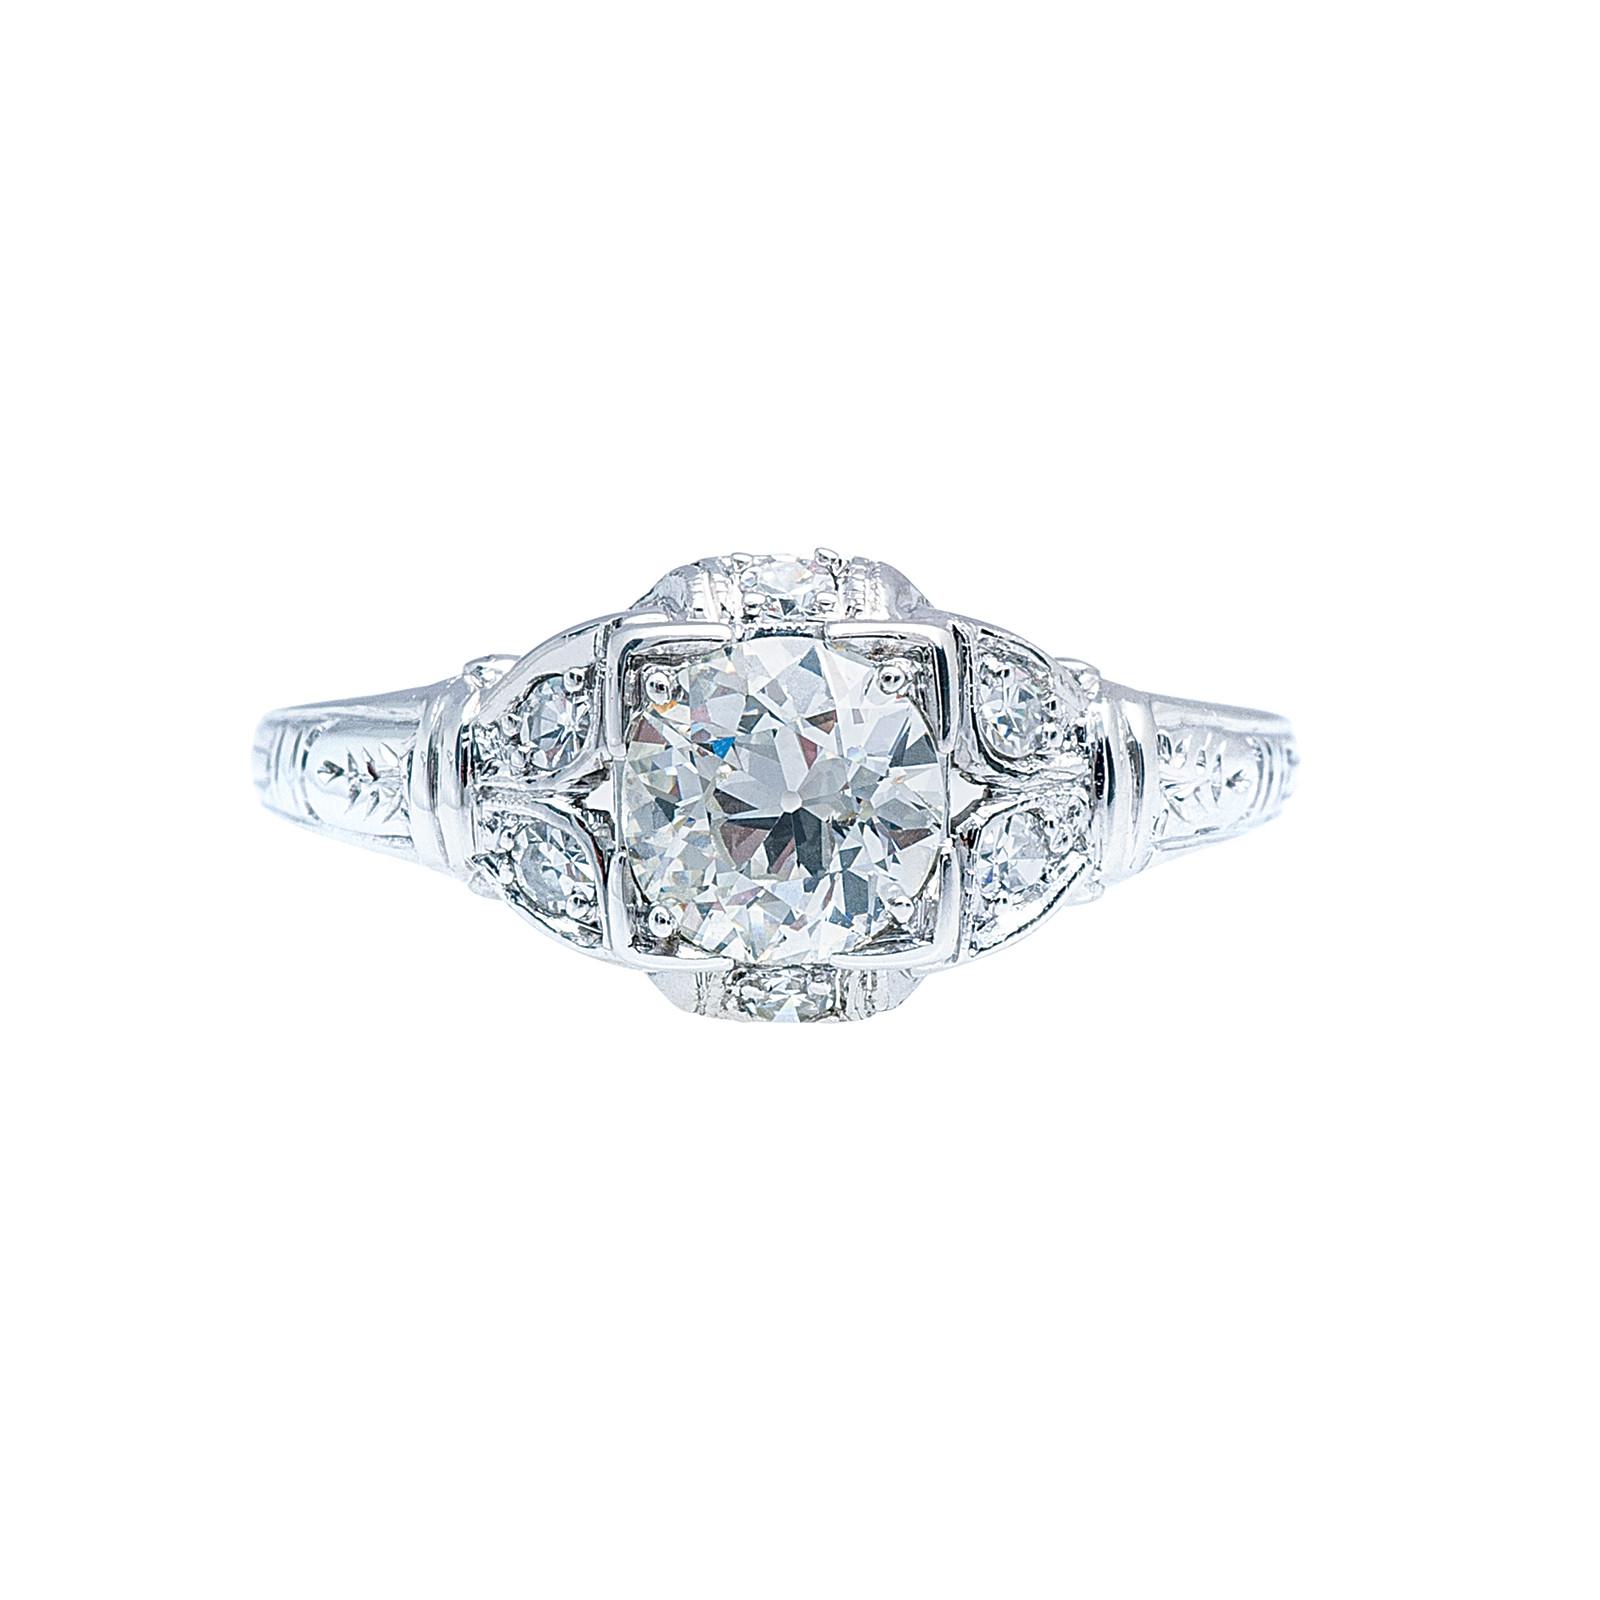 Antique Edwardian 0.74 CTW Diamond Engagement Ring